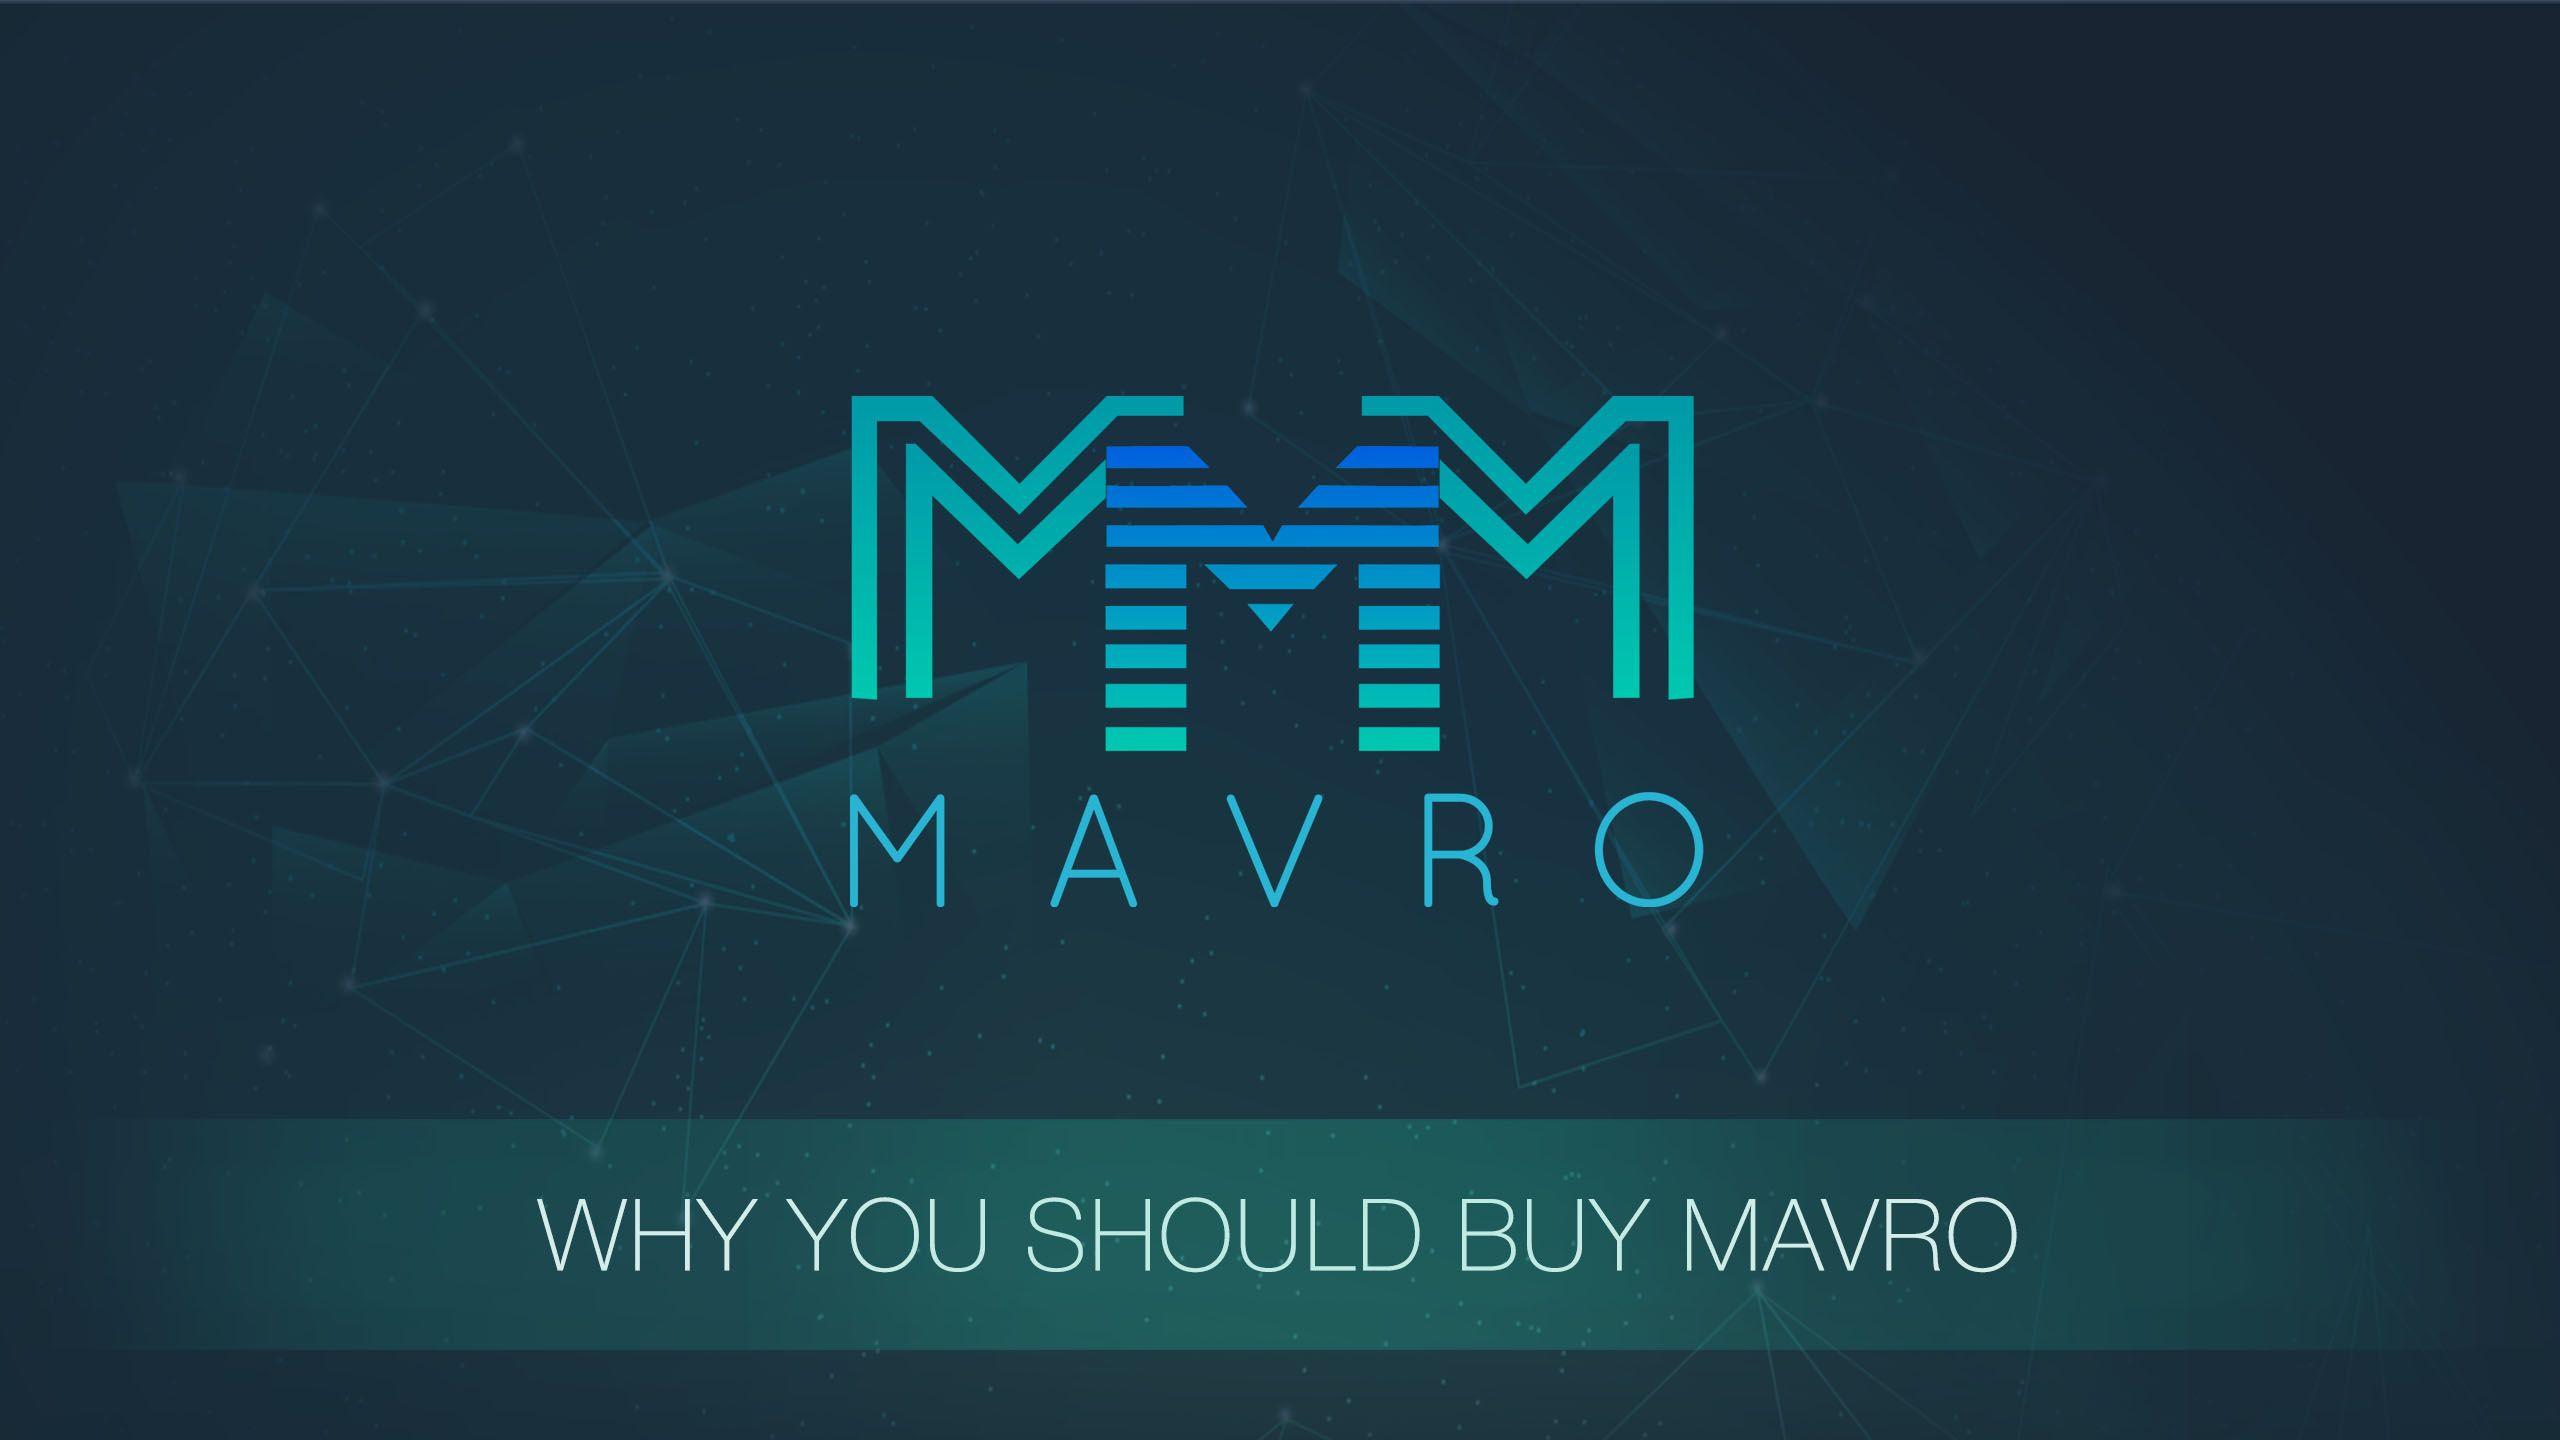 WHY YOU SHOULD BUY MAVRO.jpg